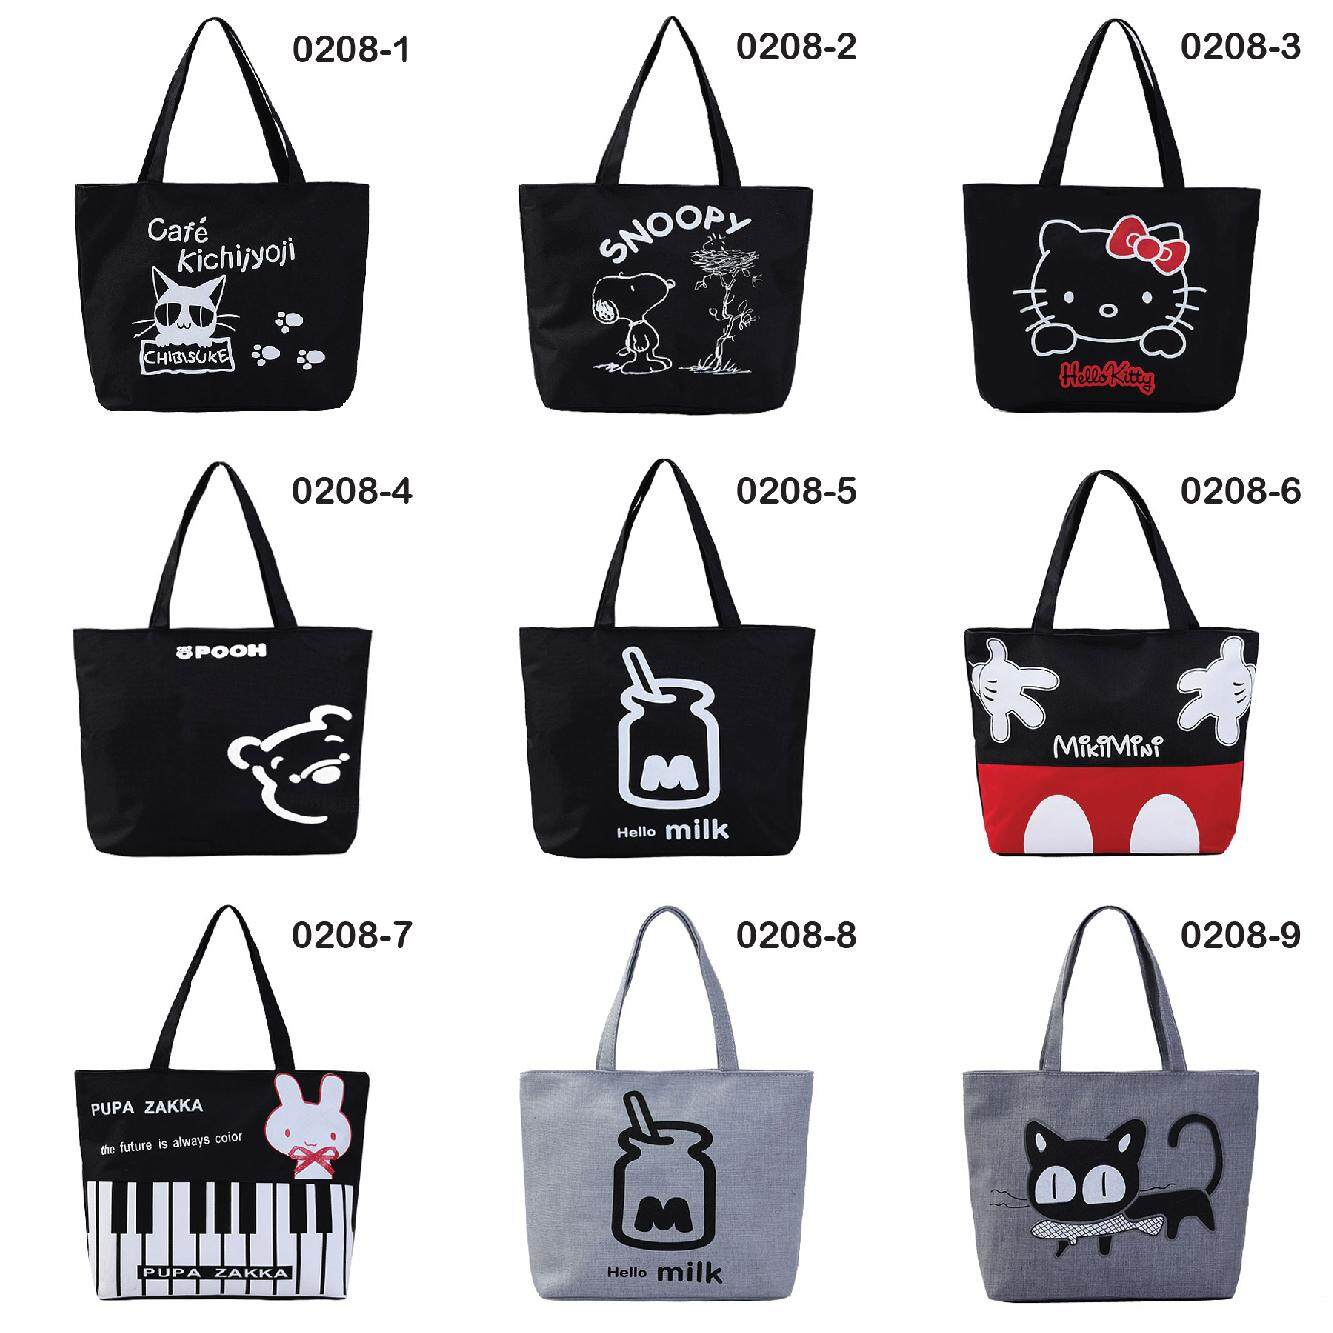 Vc Trendy Canvas Tote Bag Shoulder Bag 0208 By Vc Online.